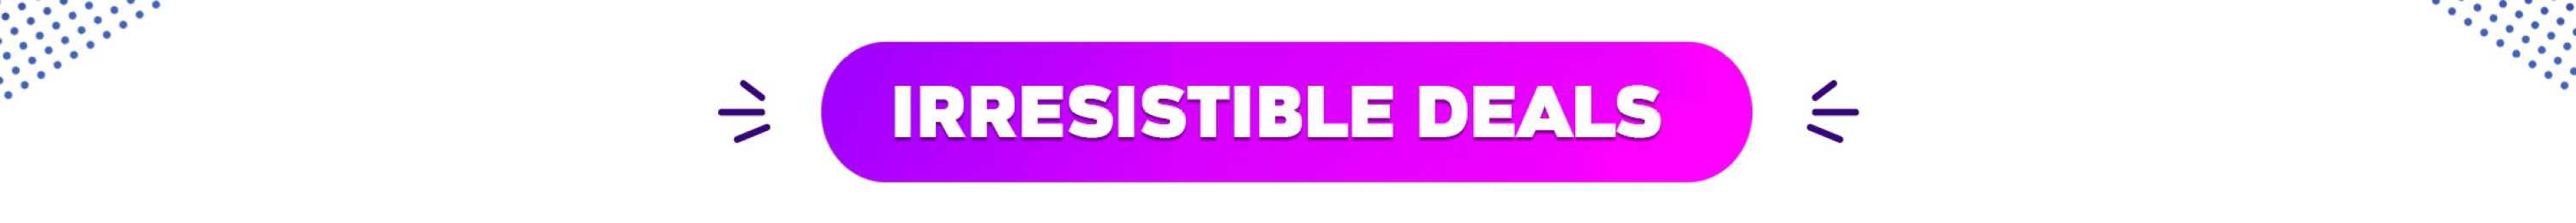 MBS18-Irresistible-deals-Header